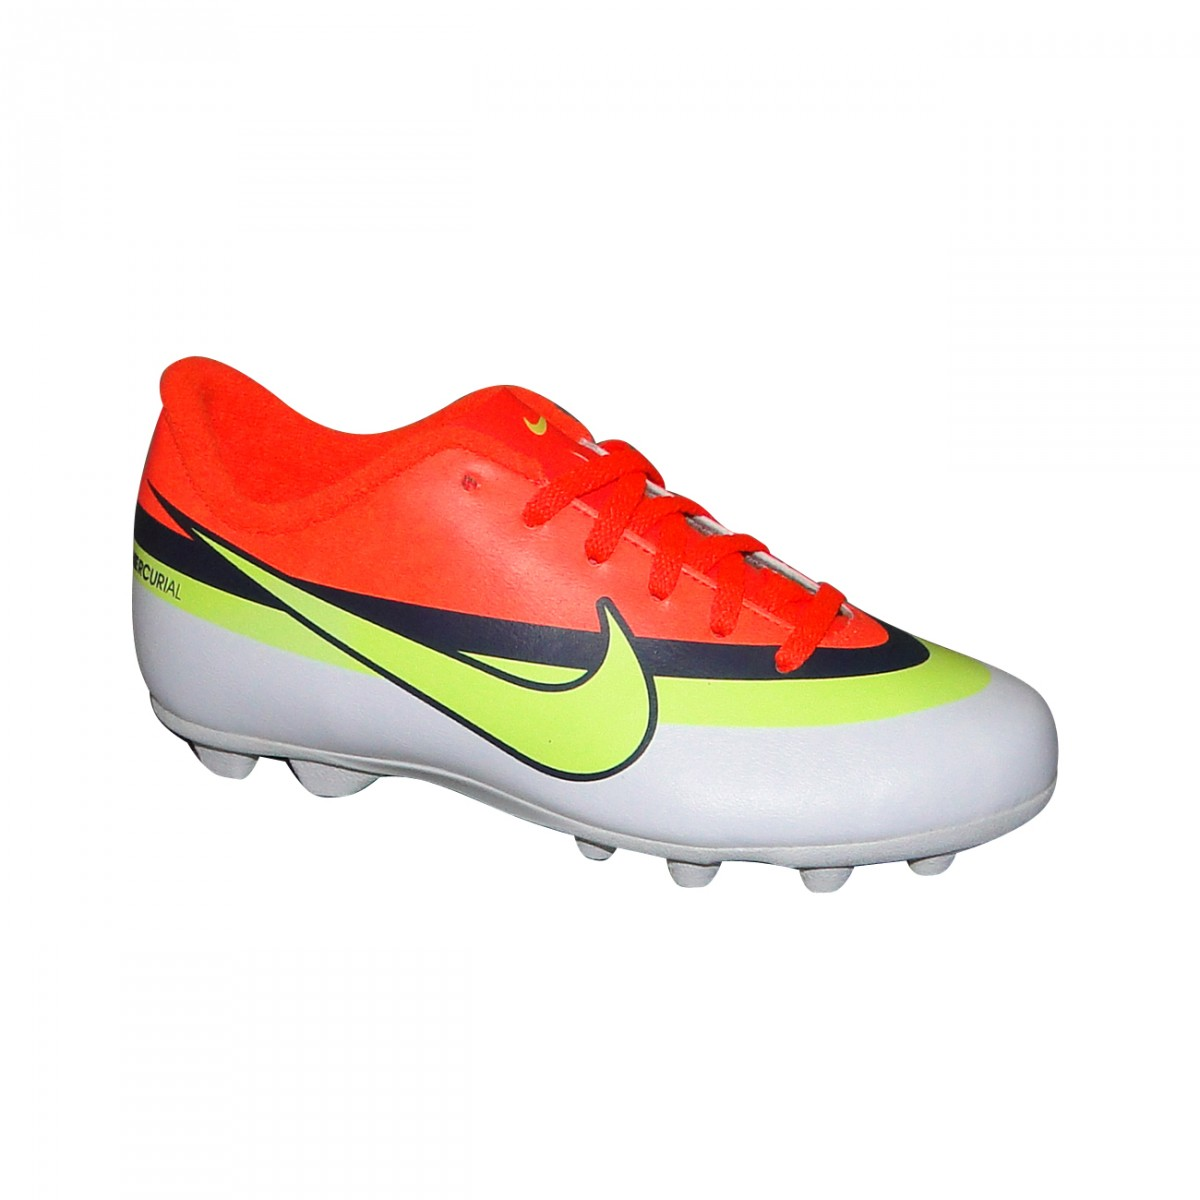 9dcc5bbe17 Chuteira Nike Mercurial Vortex Infantil 587244-174 - Laranja Limão ...